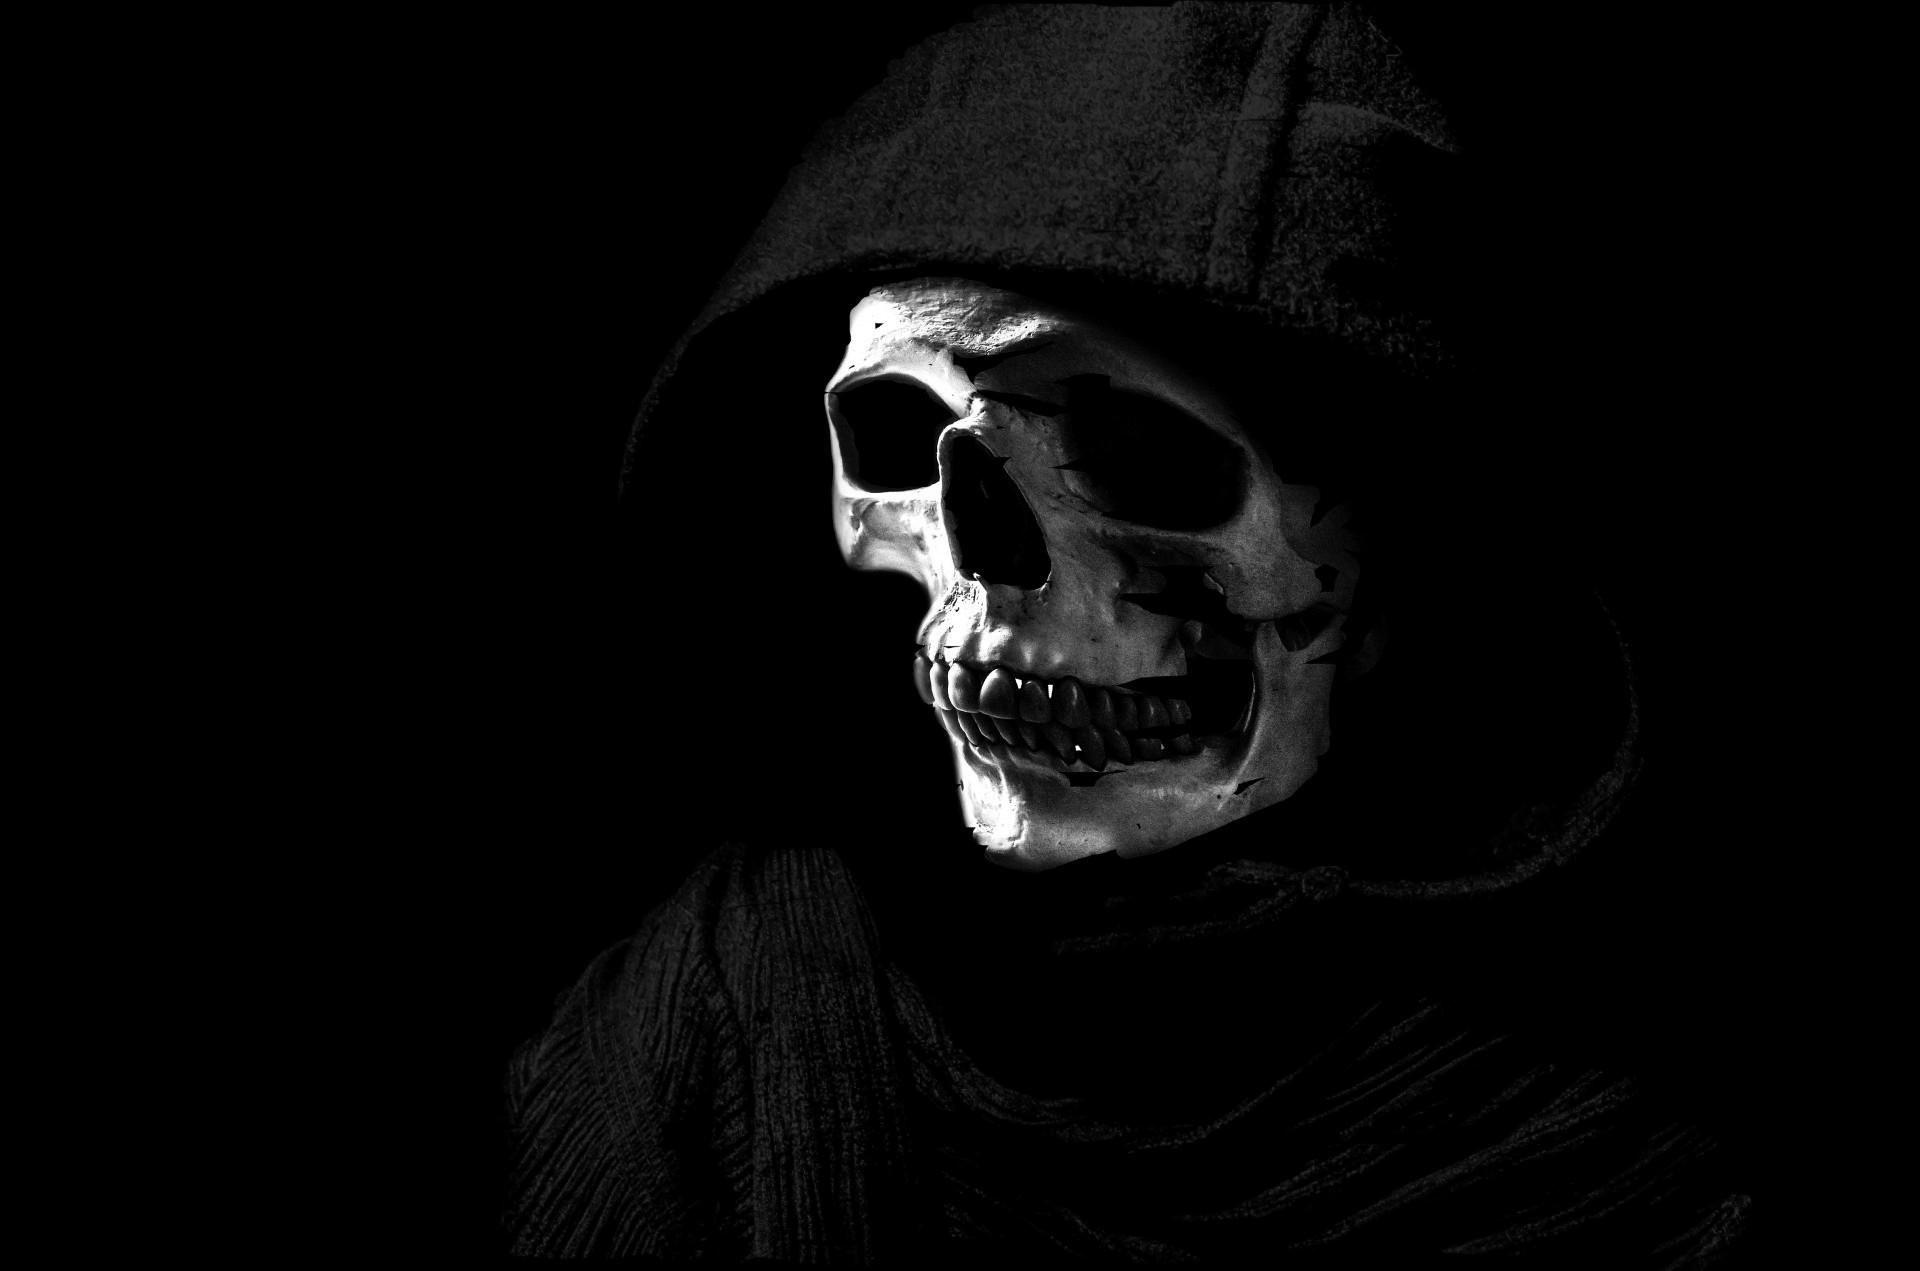 Skull And Bones Wallpaper: Skeleton Wallpapers For Desktop 2018 (43+ Images